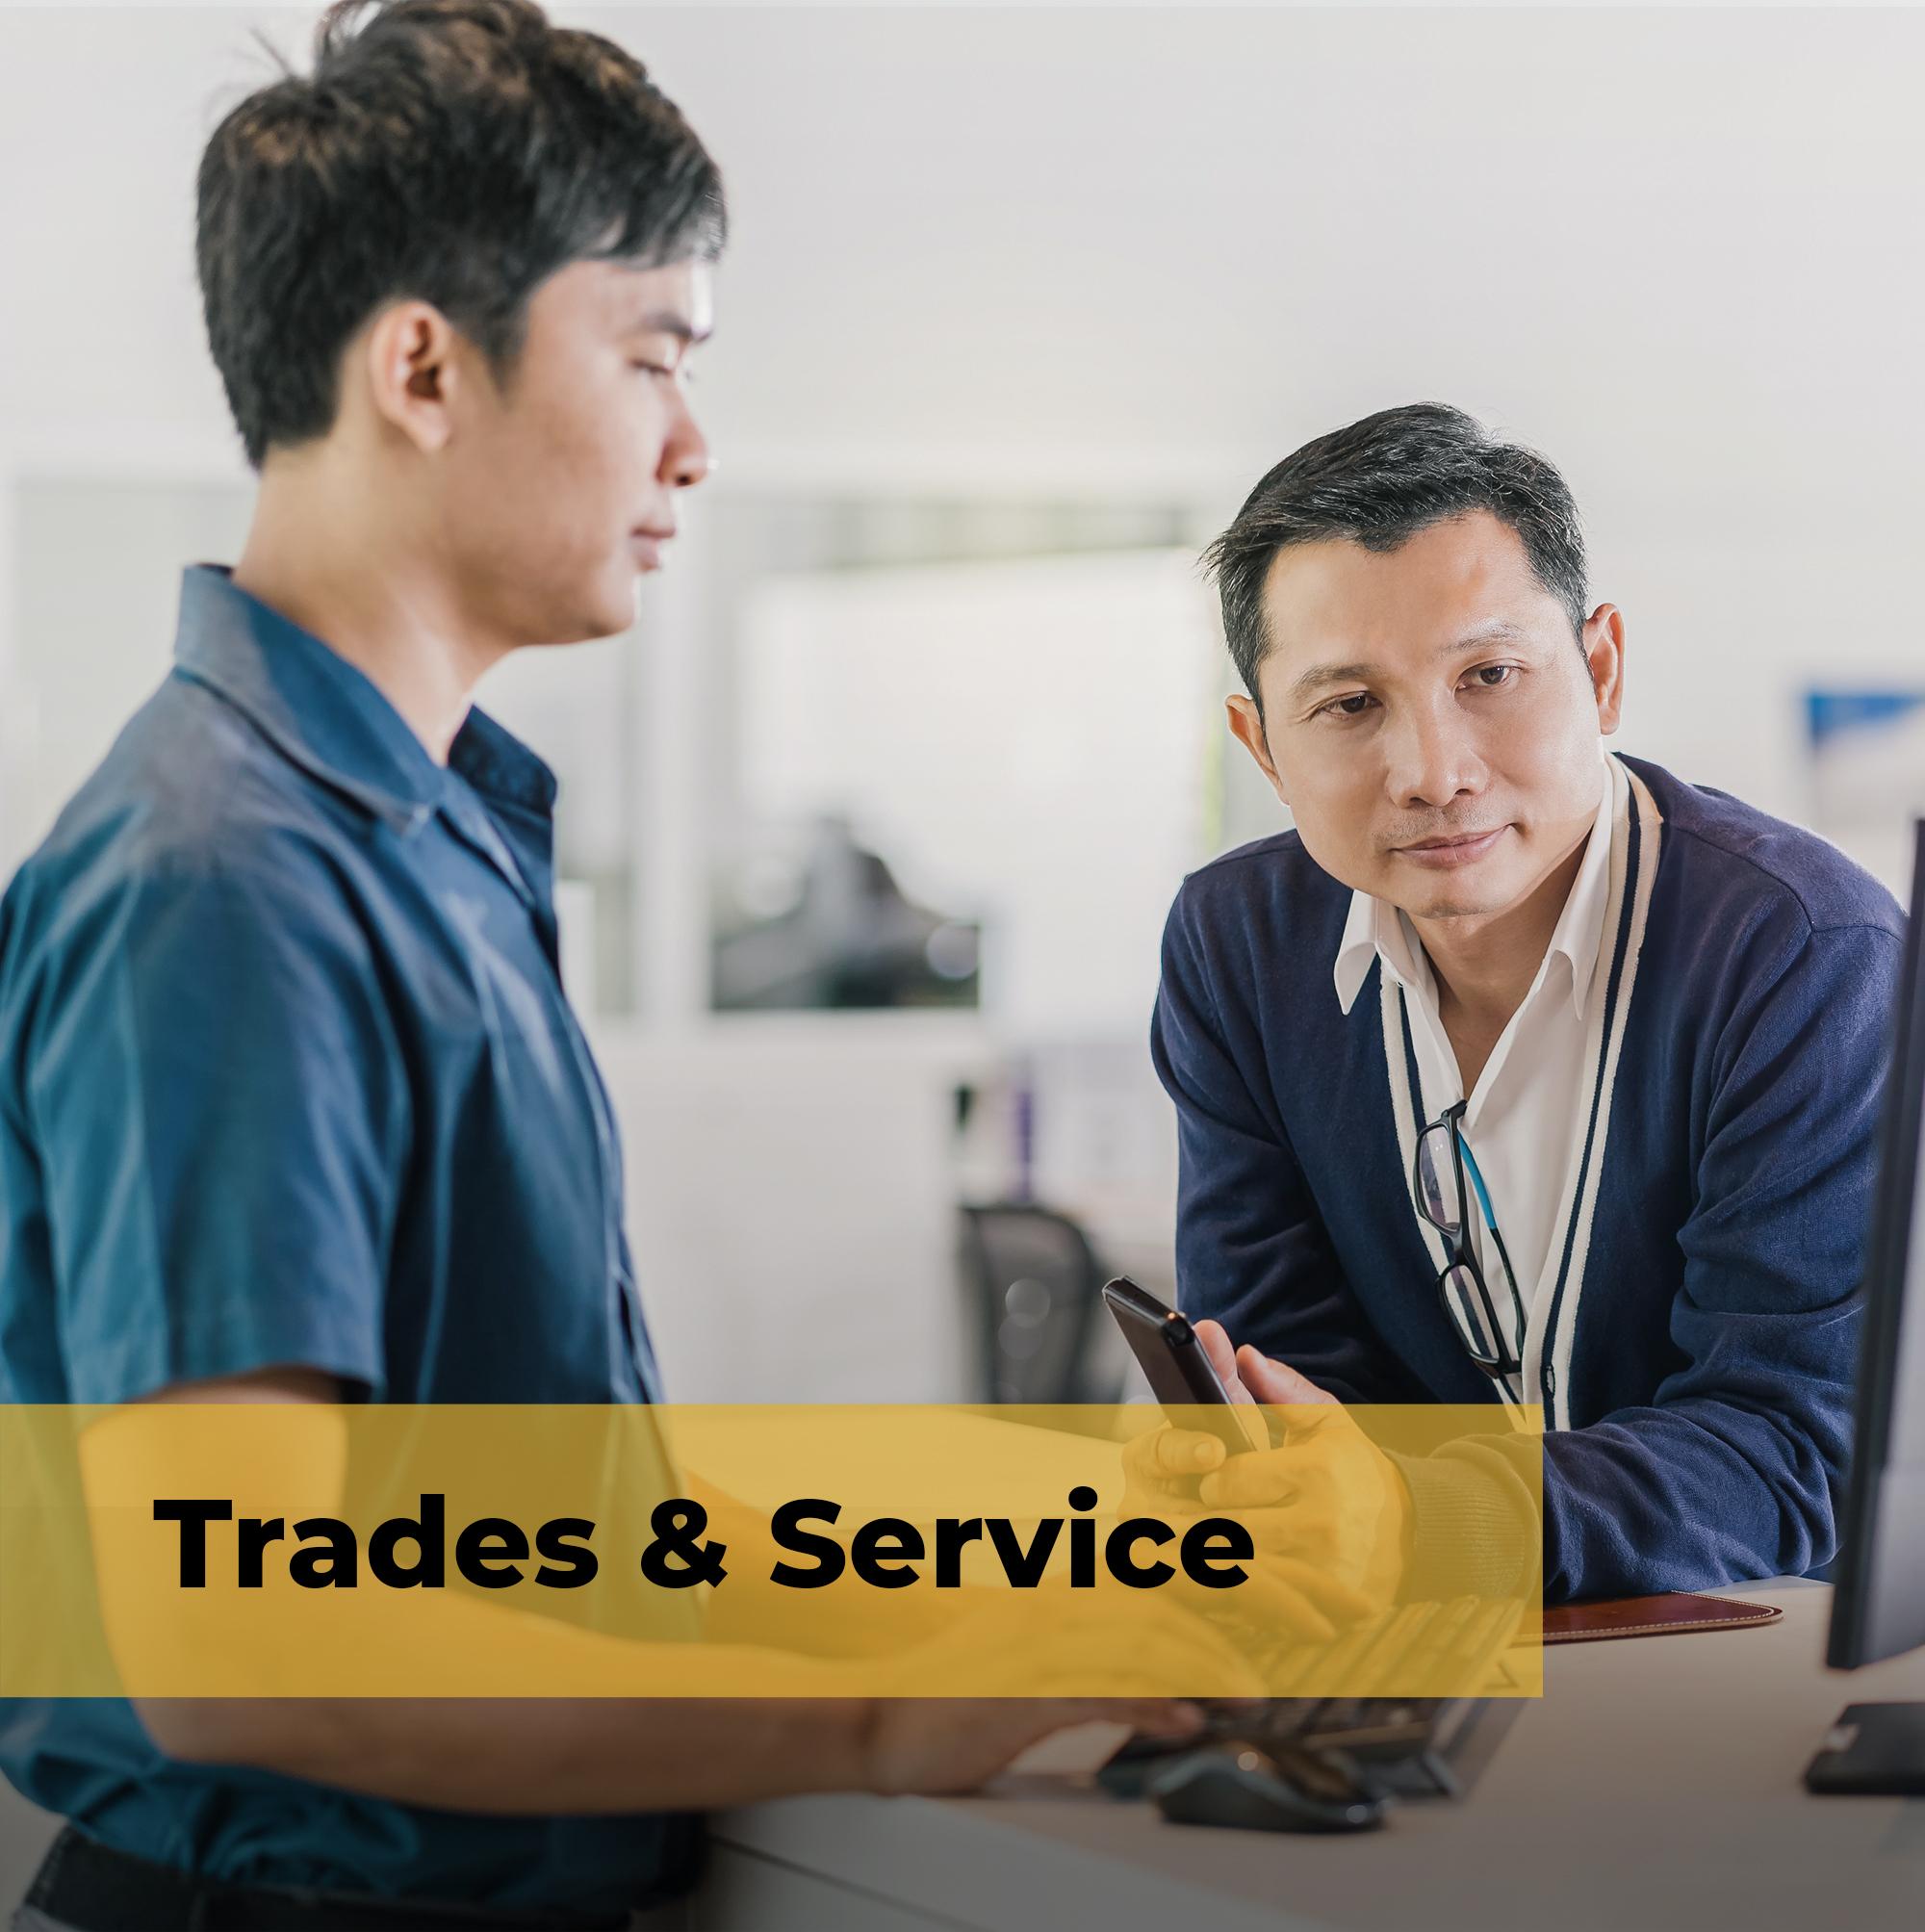 trades & service